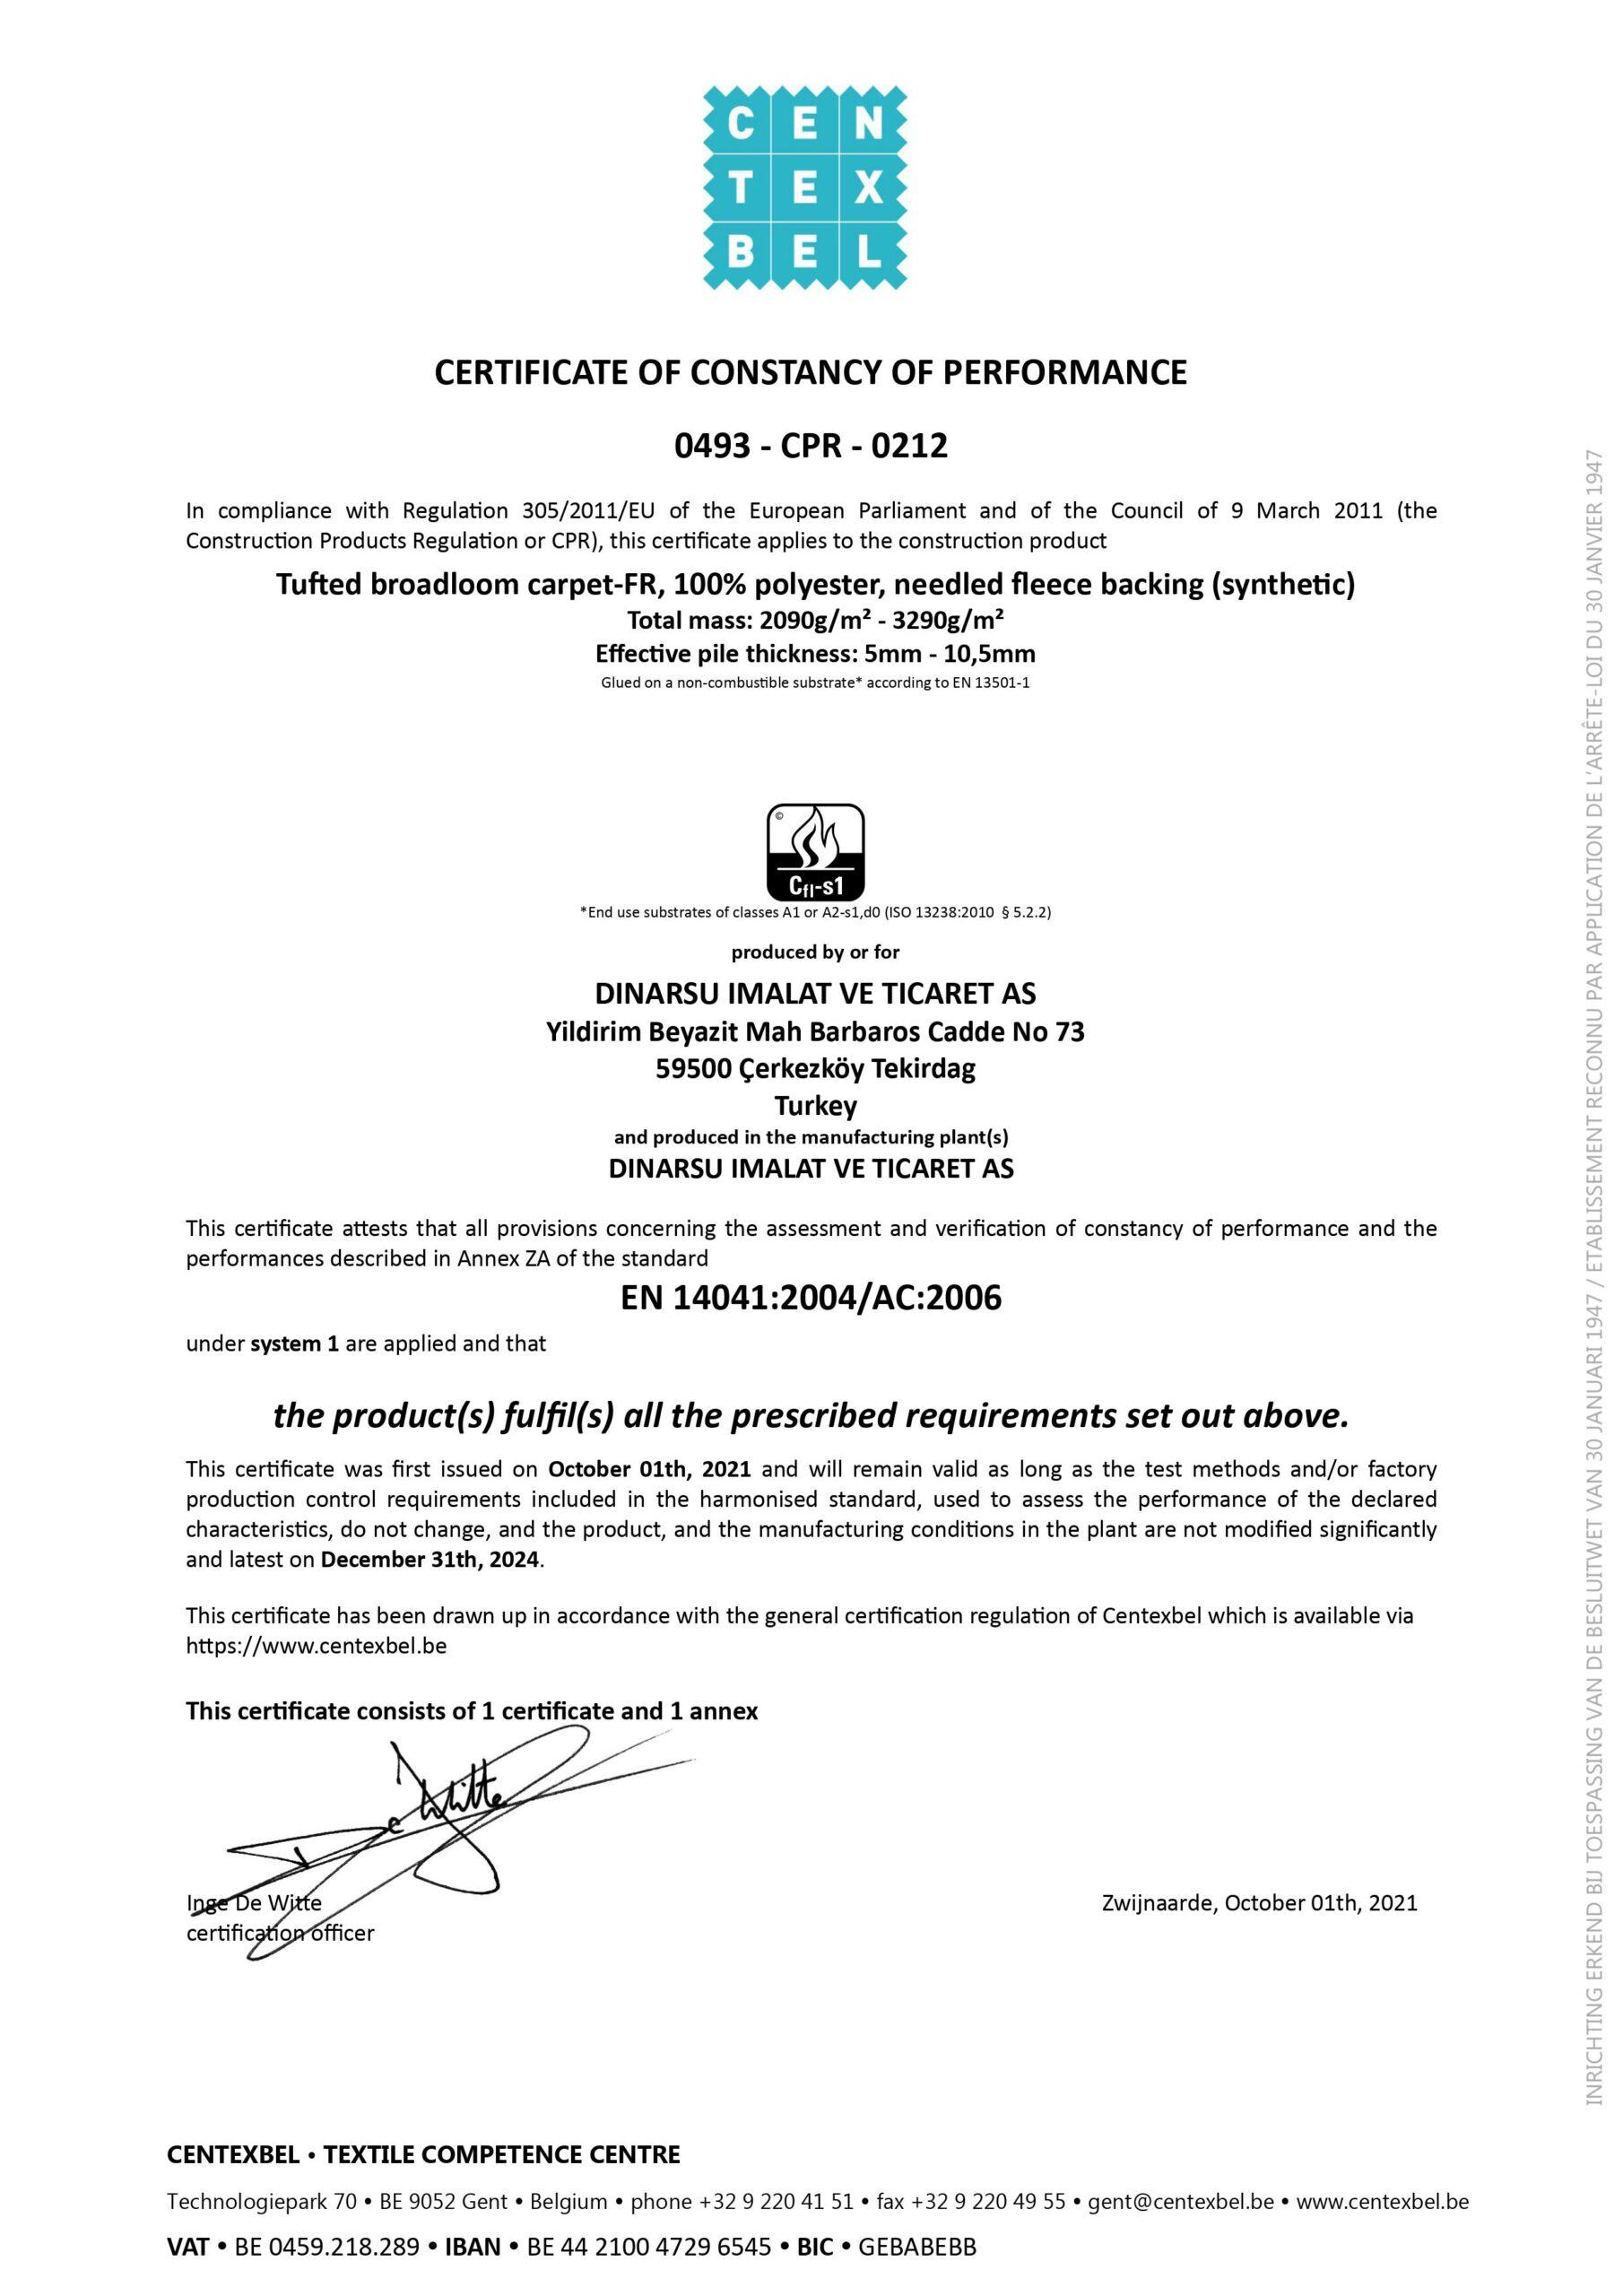 Dinarsu Sertifika – 2021